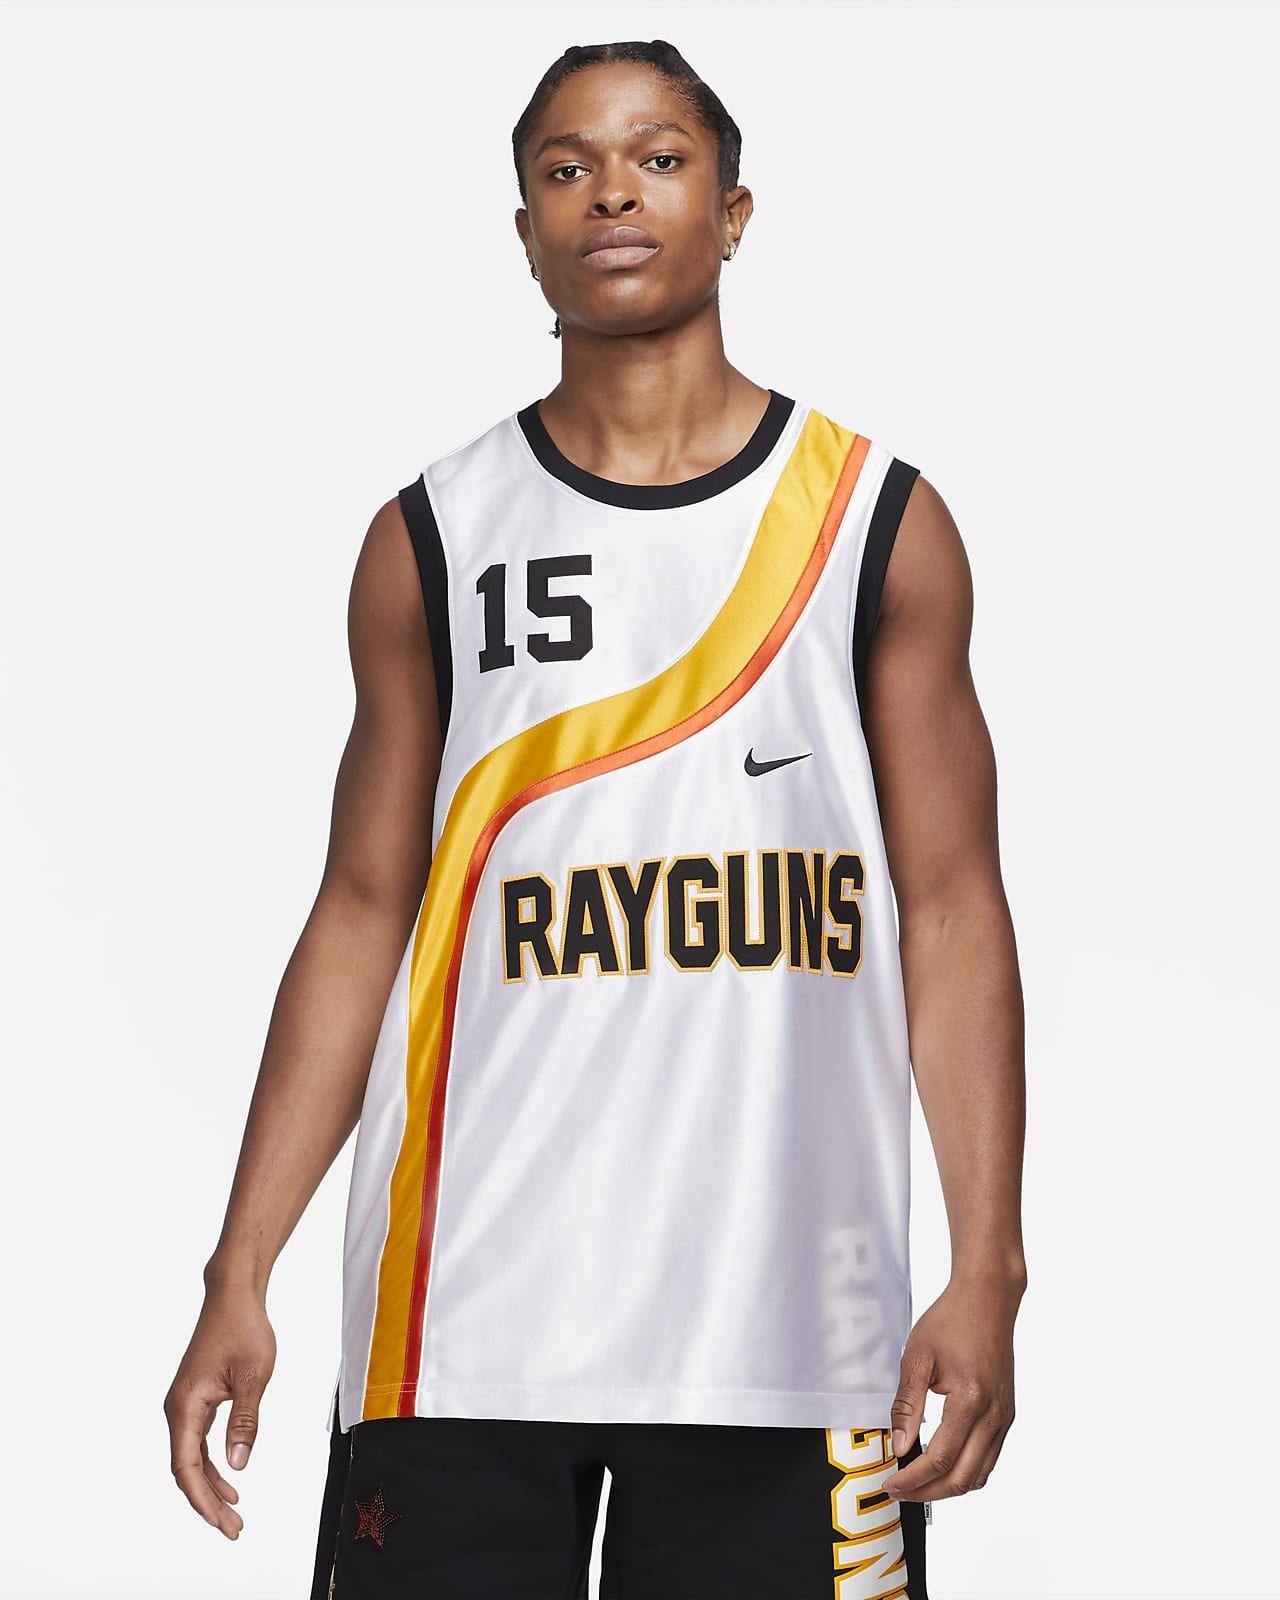 Maillot de basketball premium Nike Rayguns pour Homme